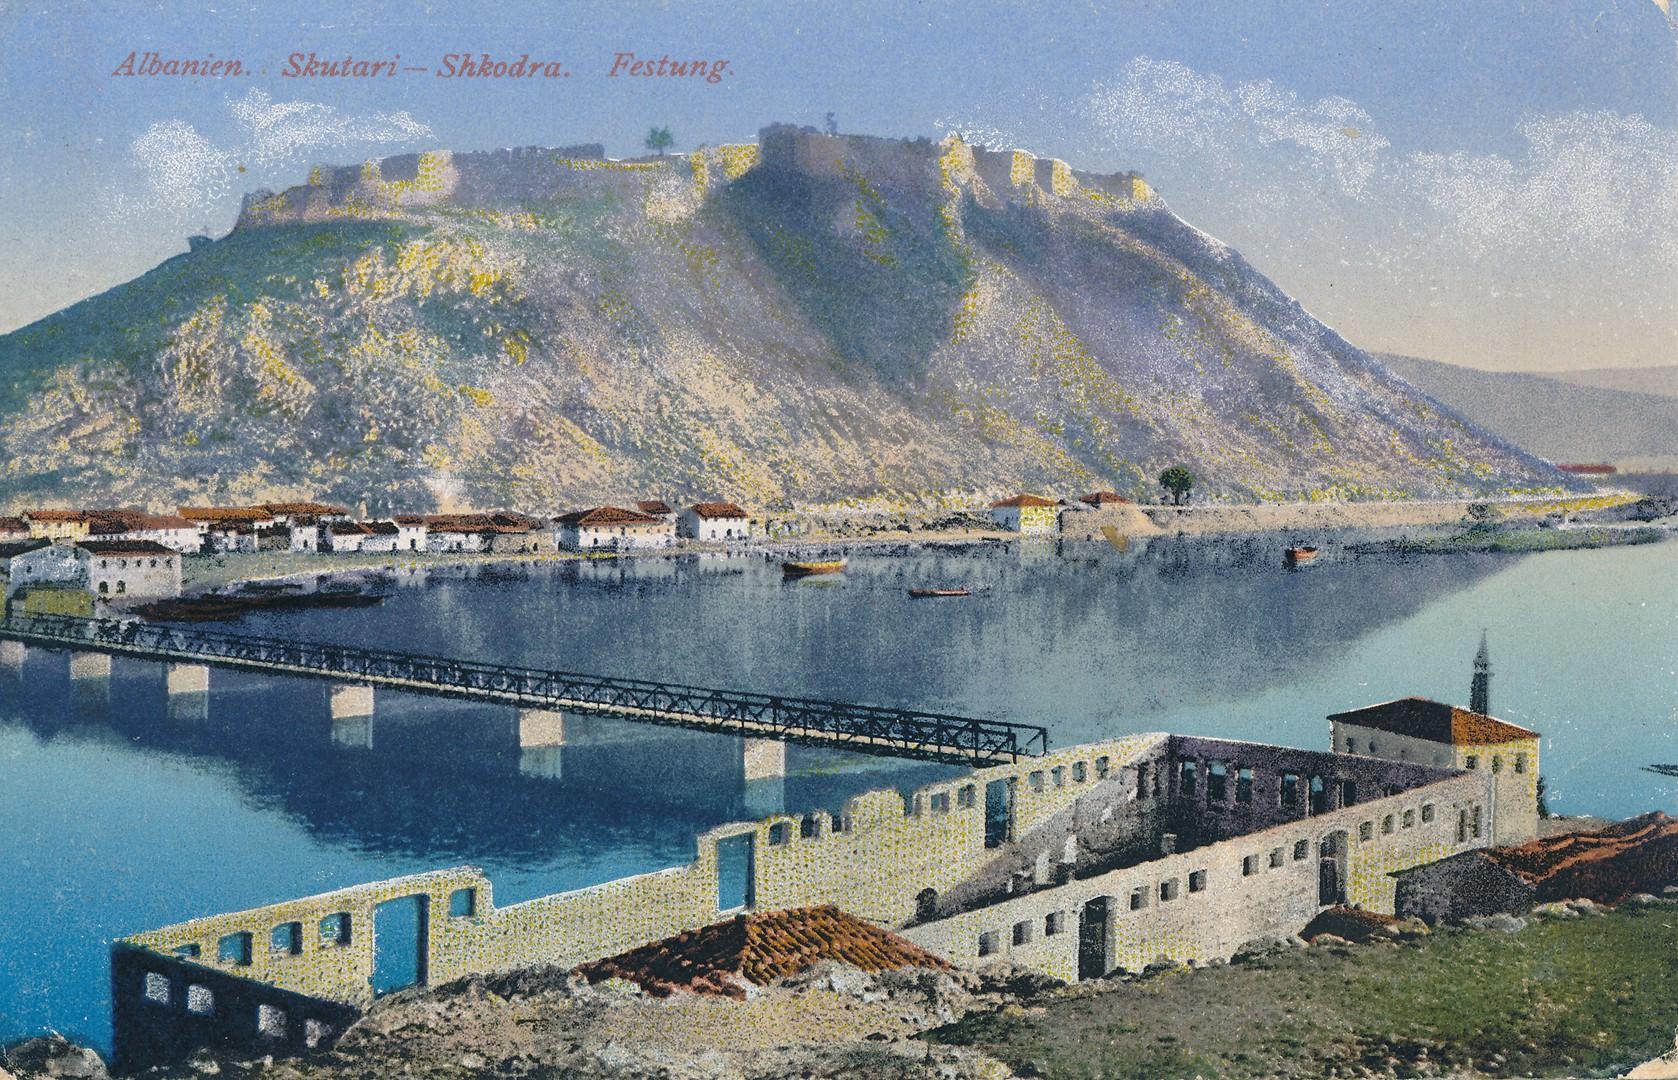 Shkodra postcard